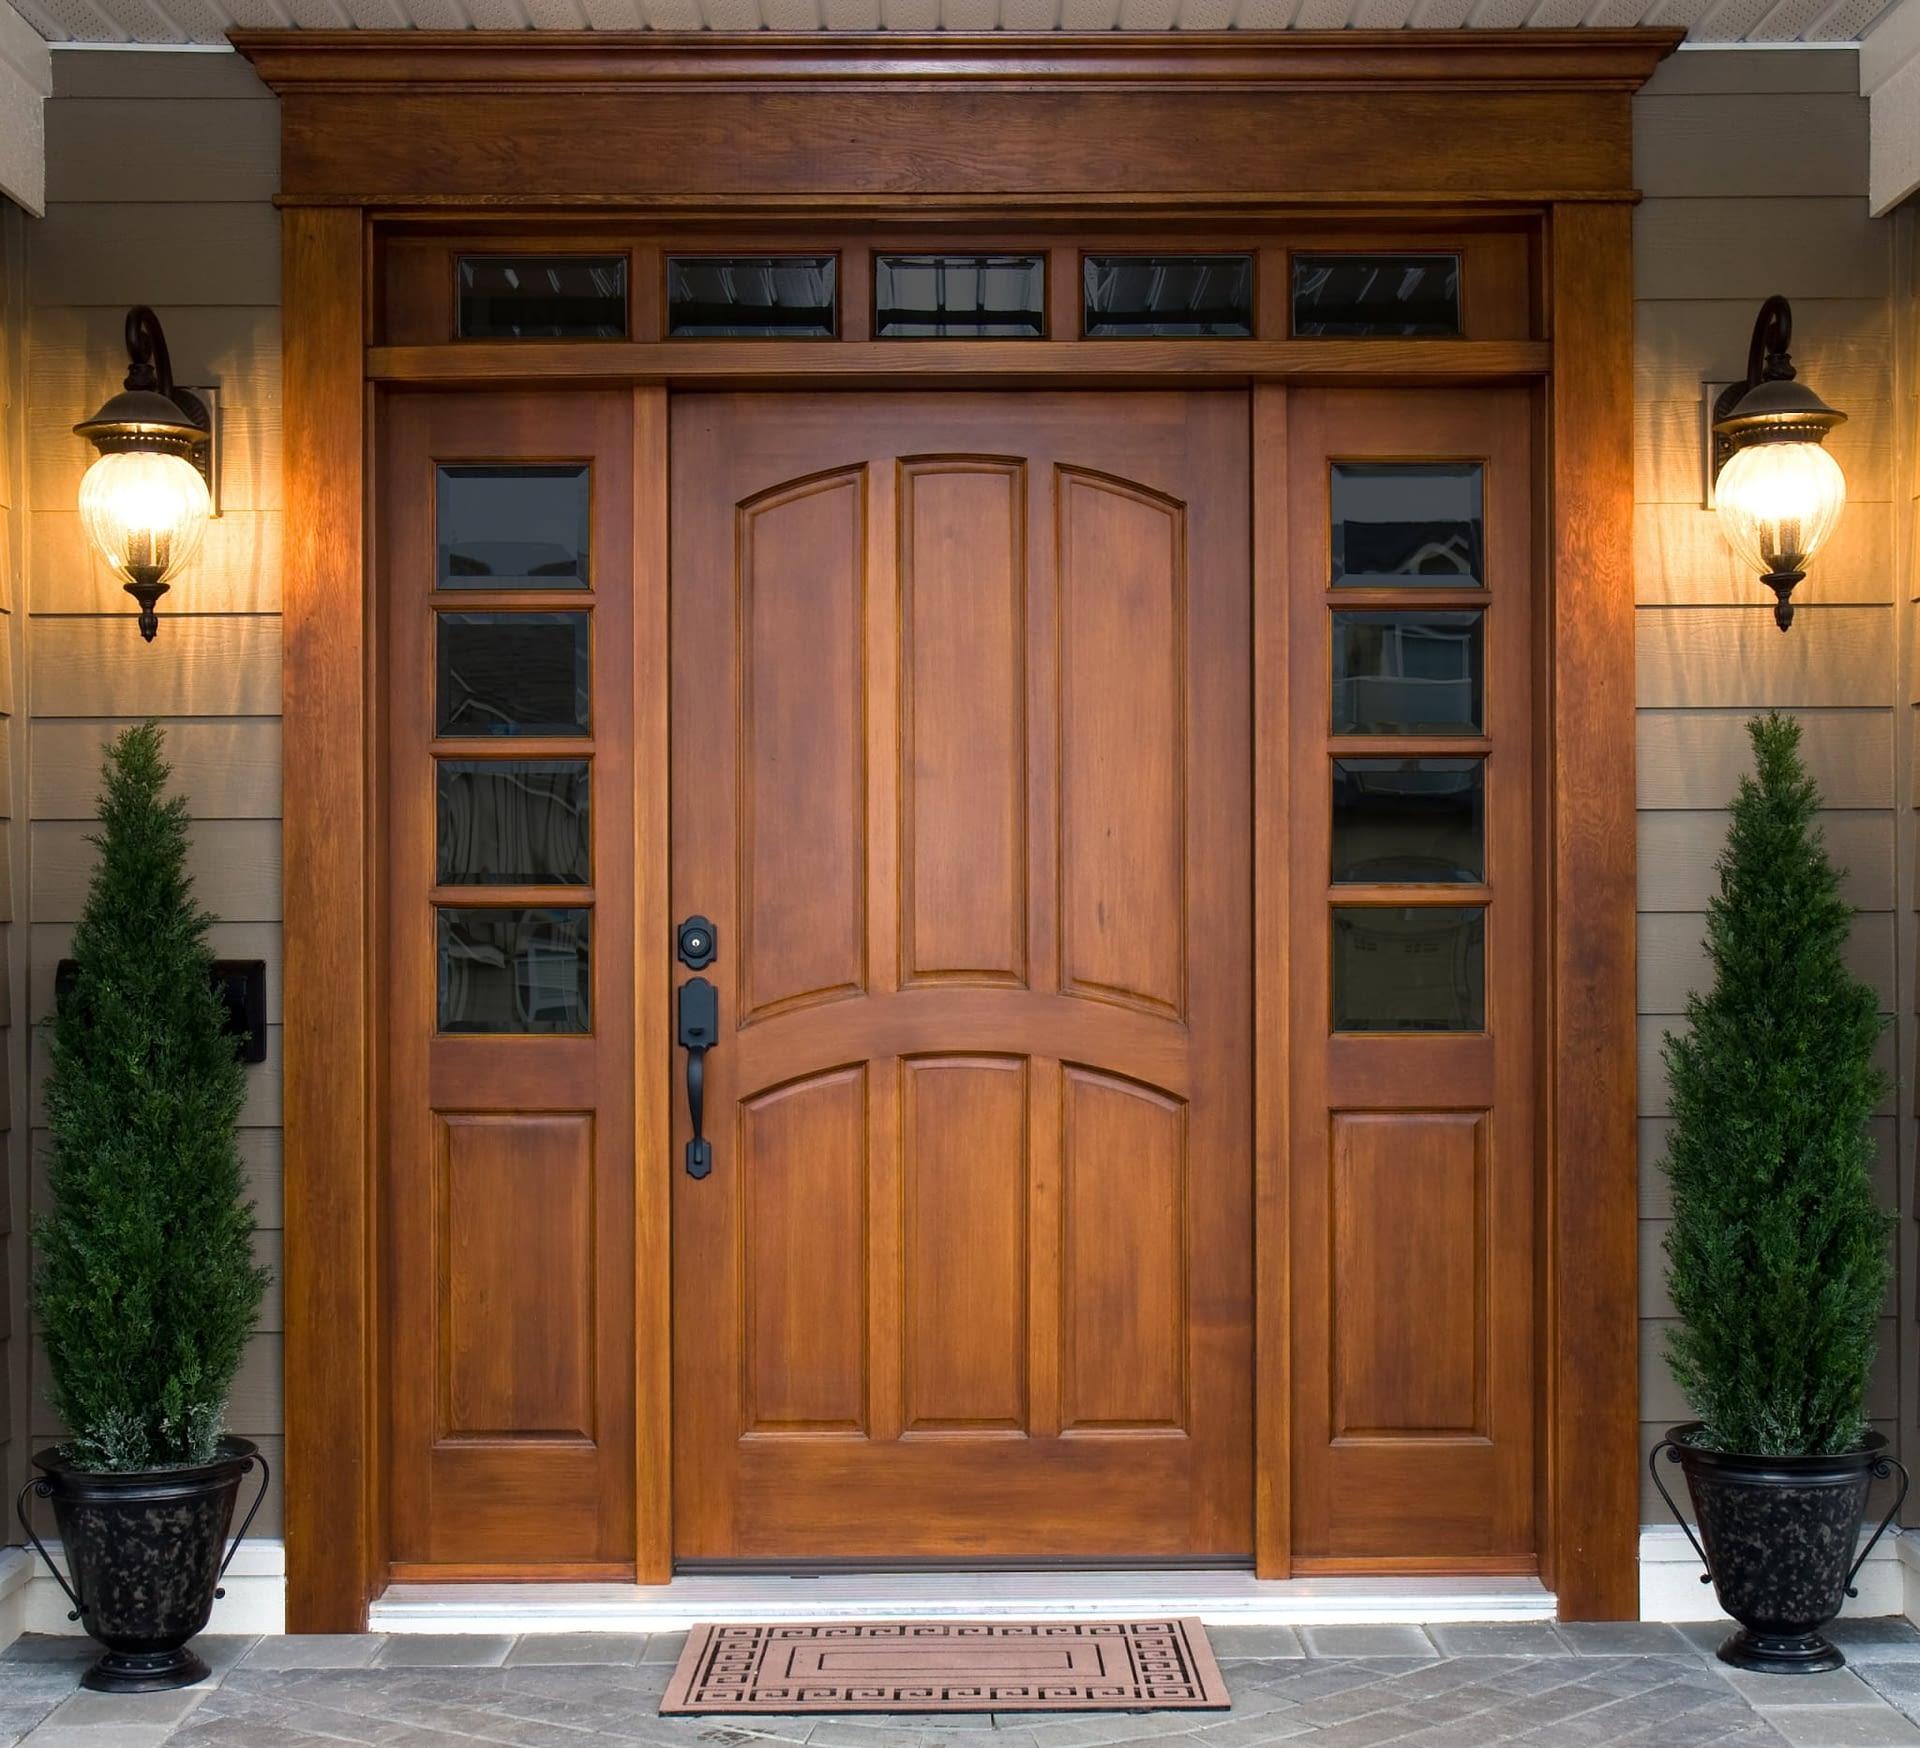 Beautiful Wooden Door New Jersey Siding Windows